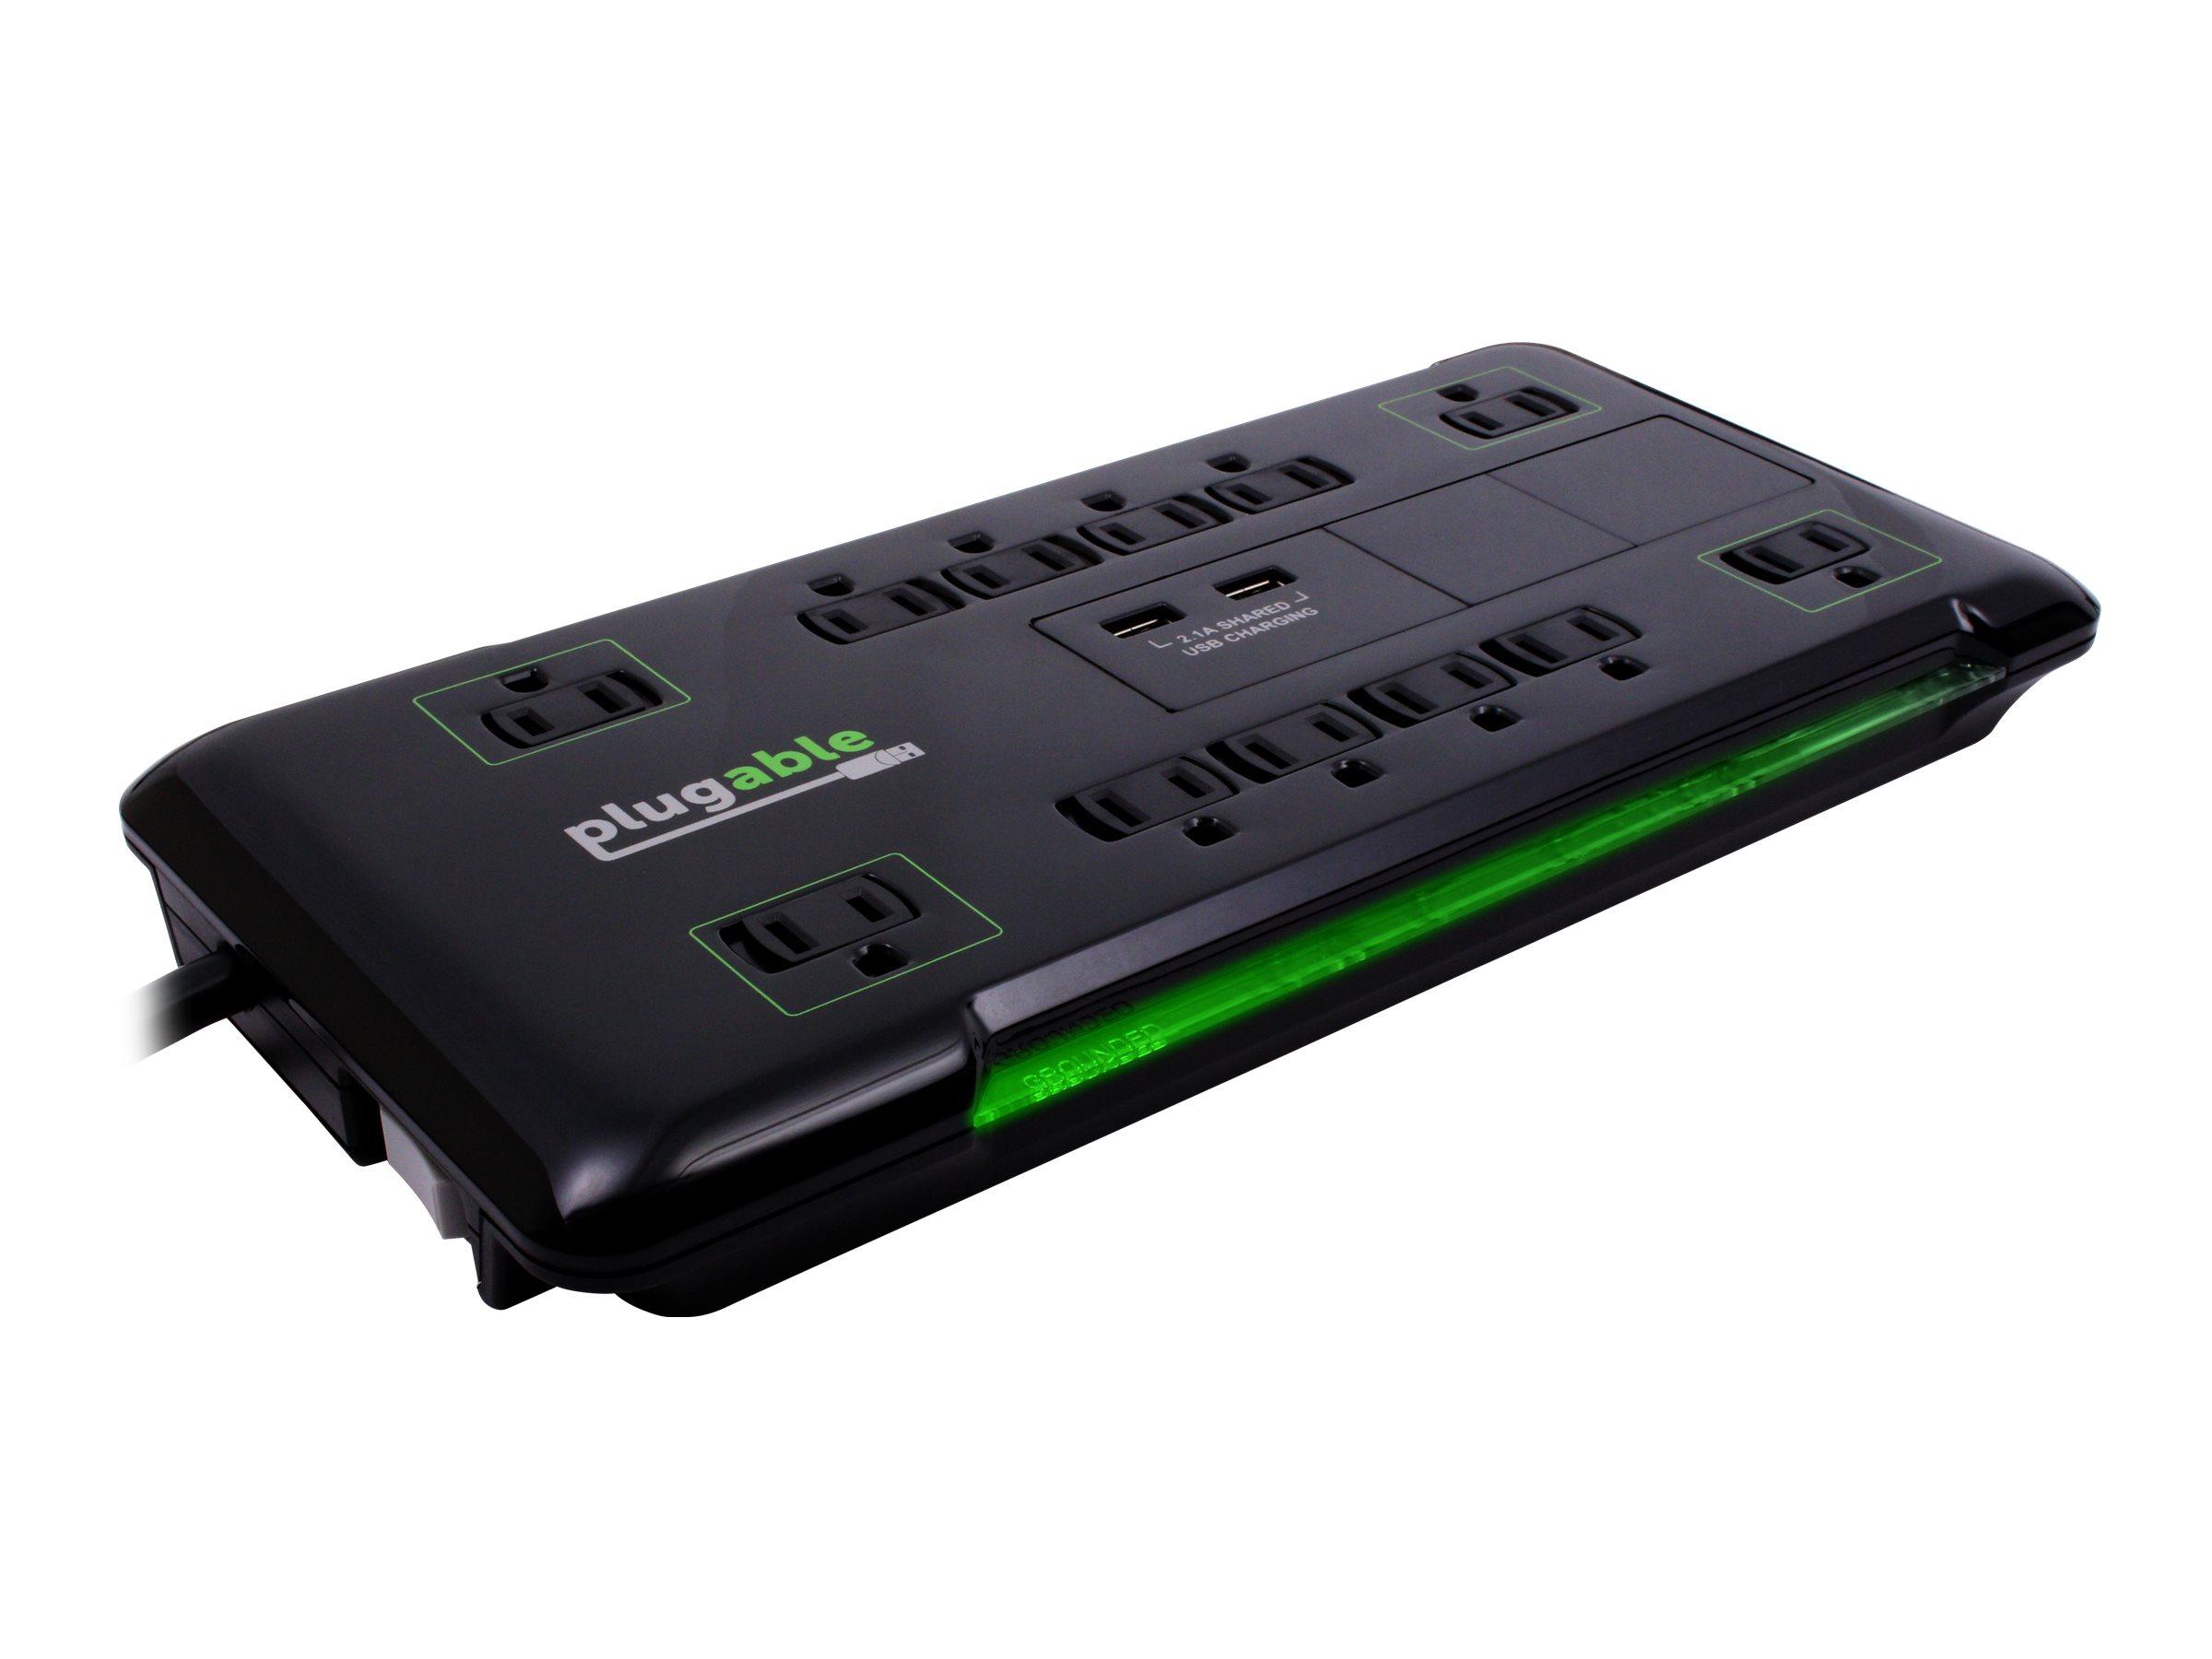 Plugable PS12-USB2B - power strip - 1800 Watt